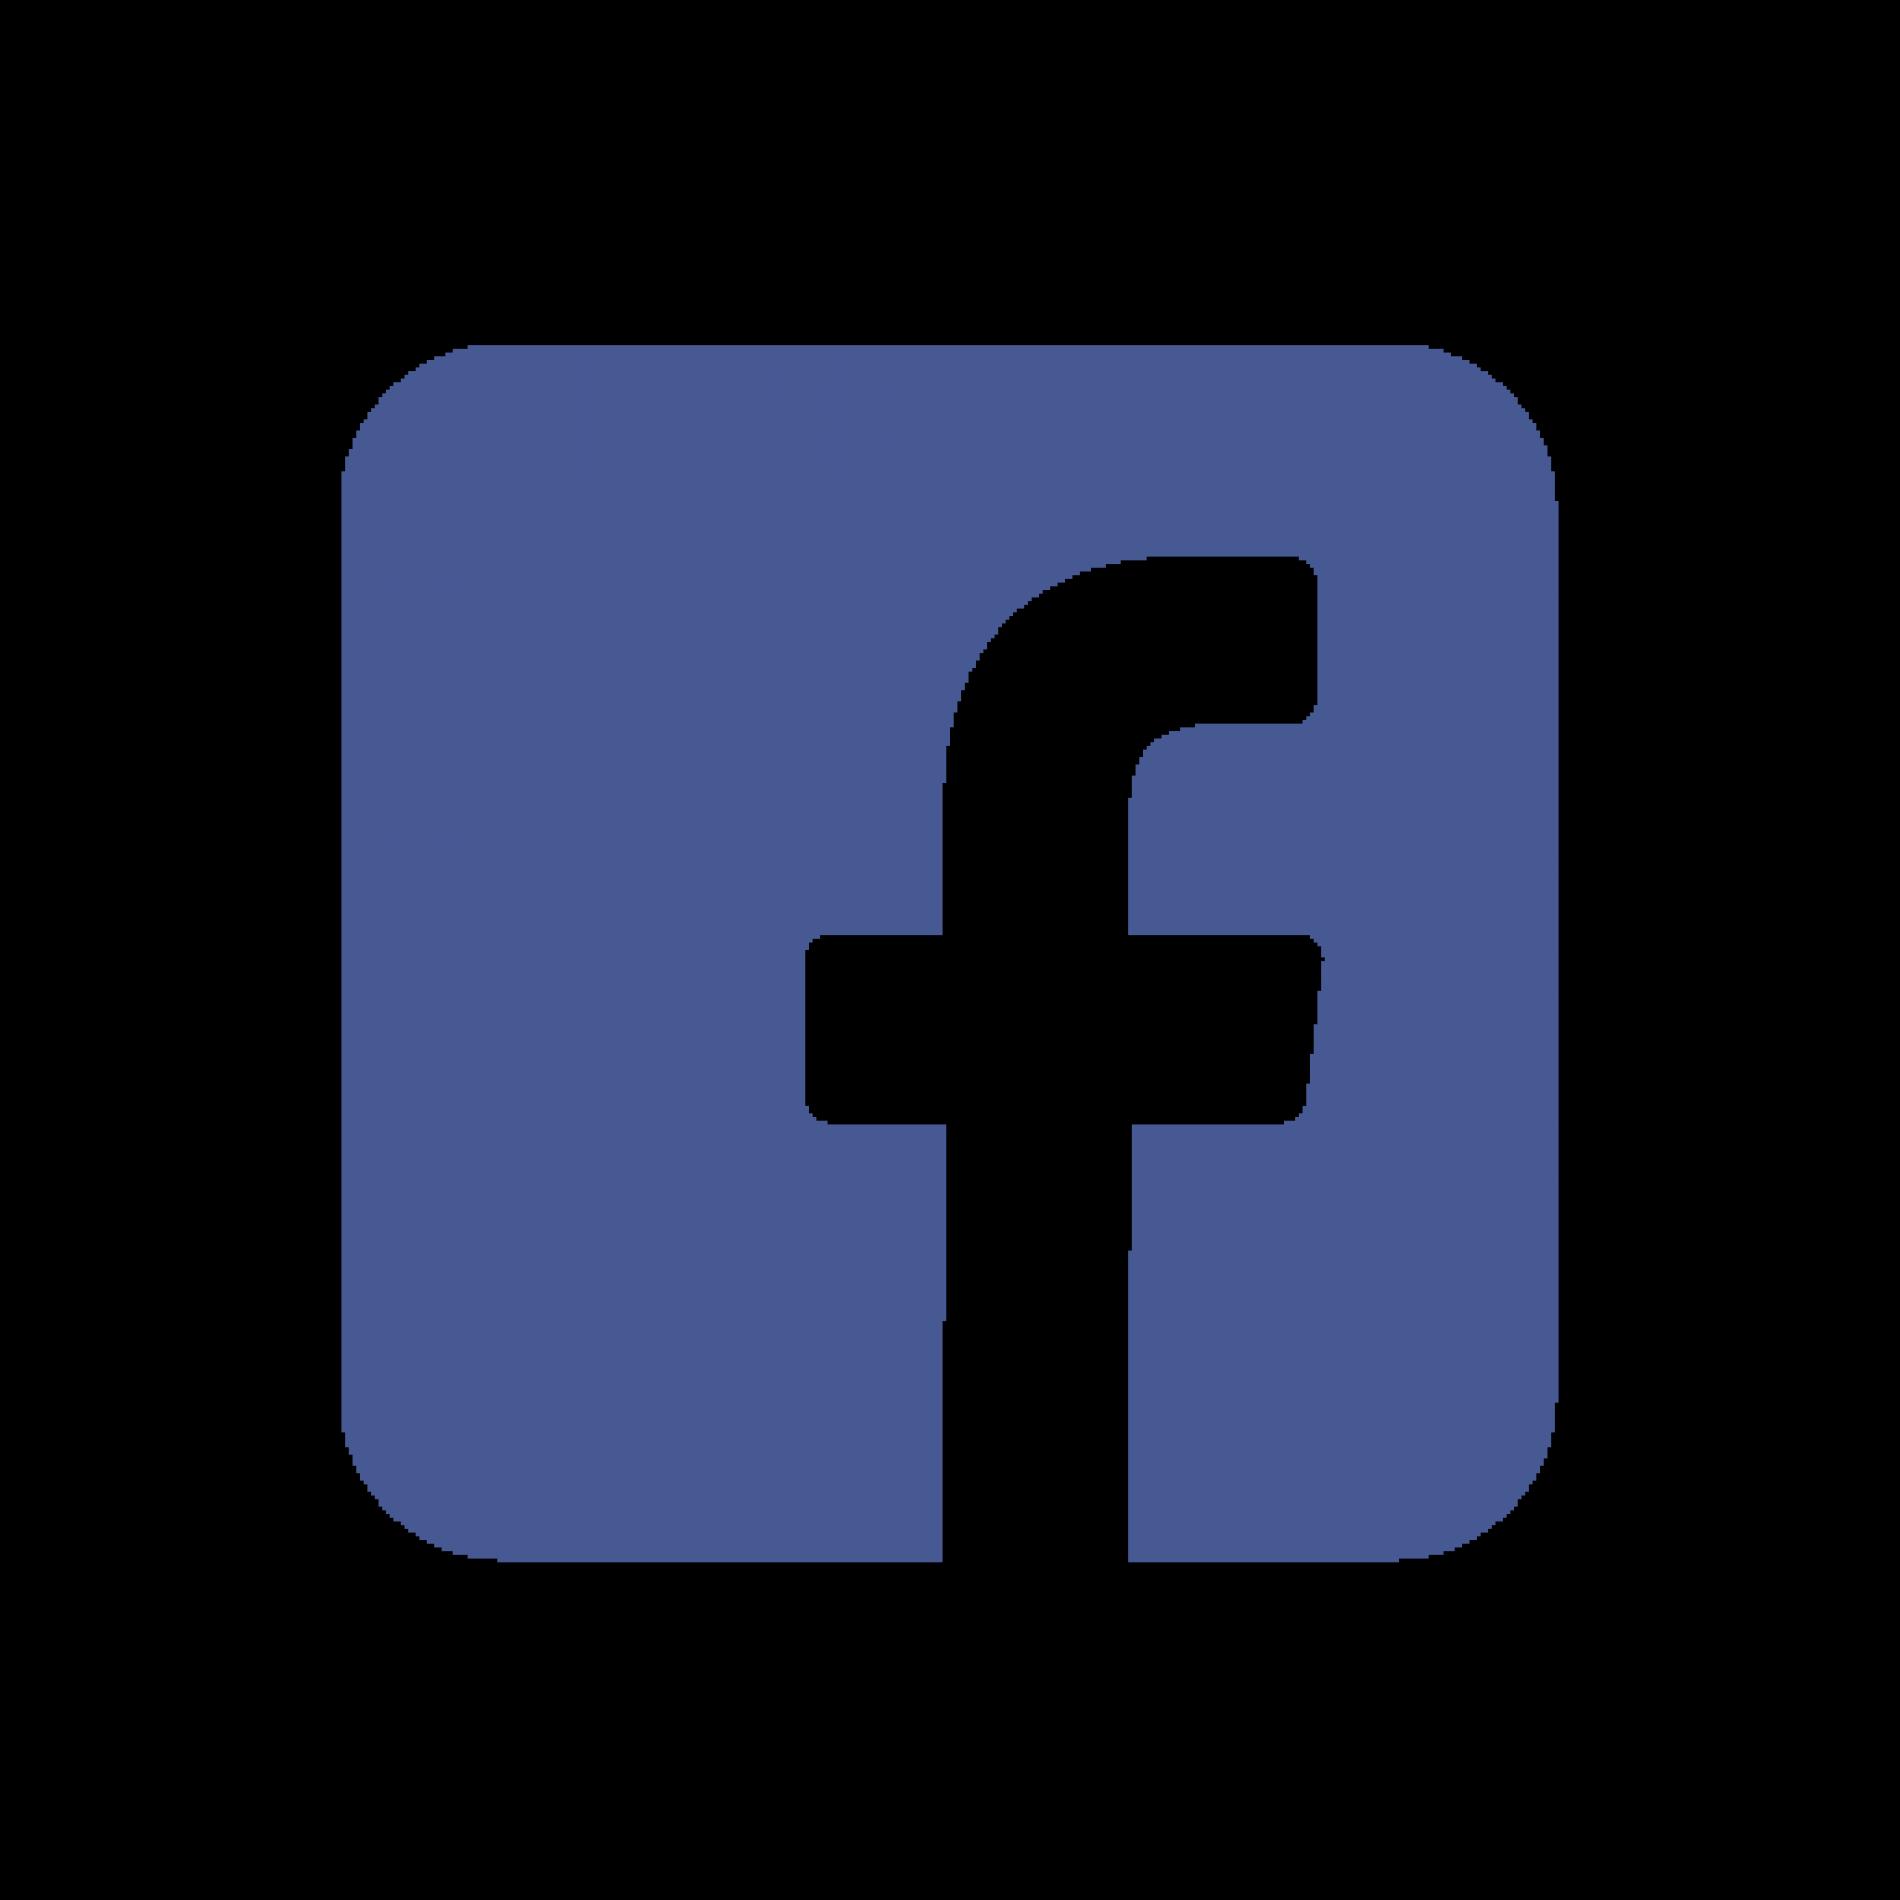 logo facebook hôtel les Jardins d'Anais, Luxemourg